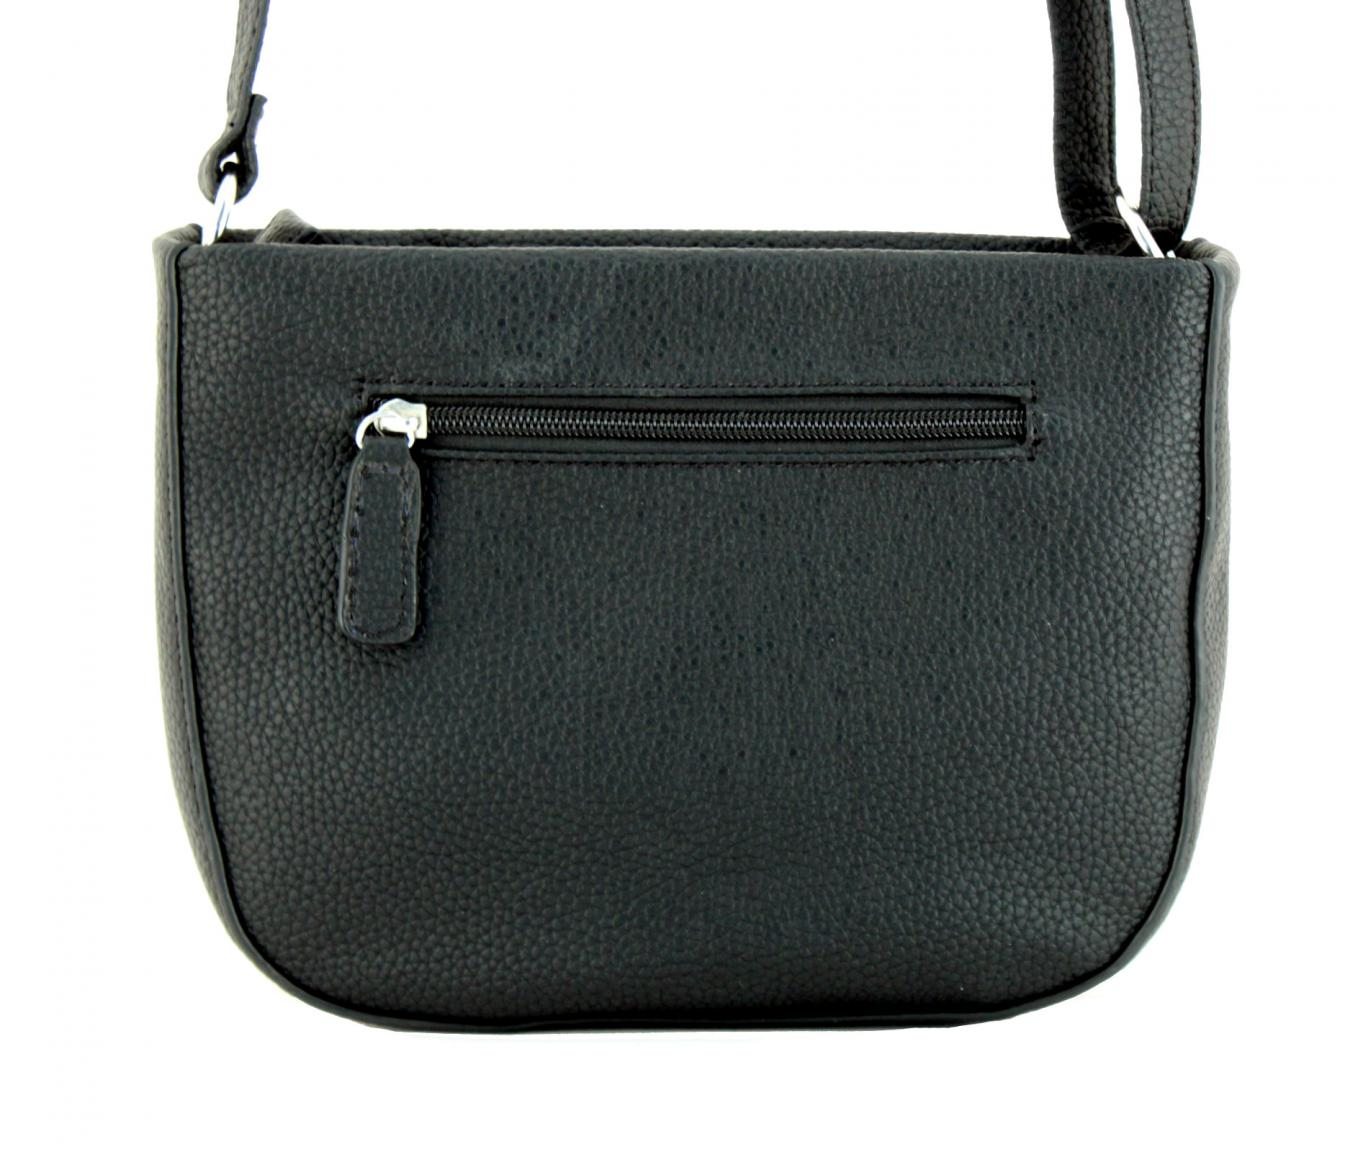 Handtasche Talk Different II HandBag SHZ Black Gerry Weber weKfO2S